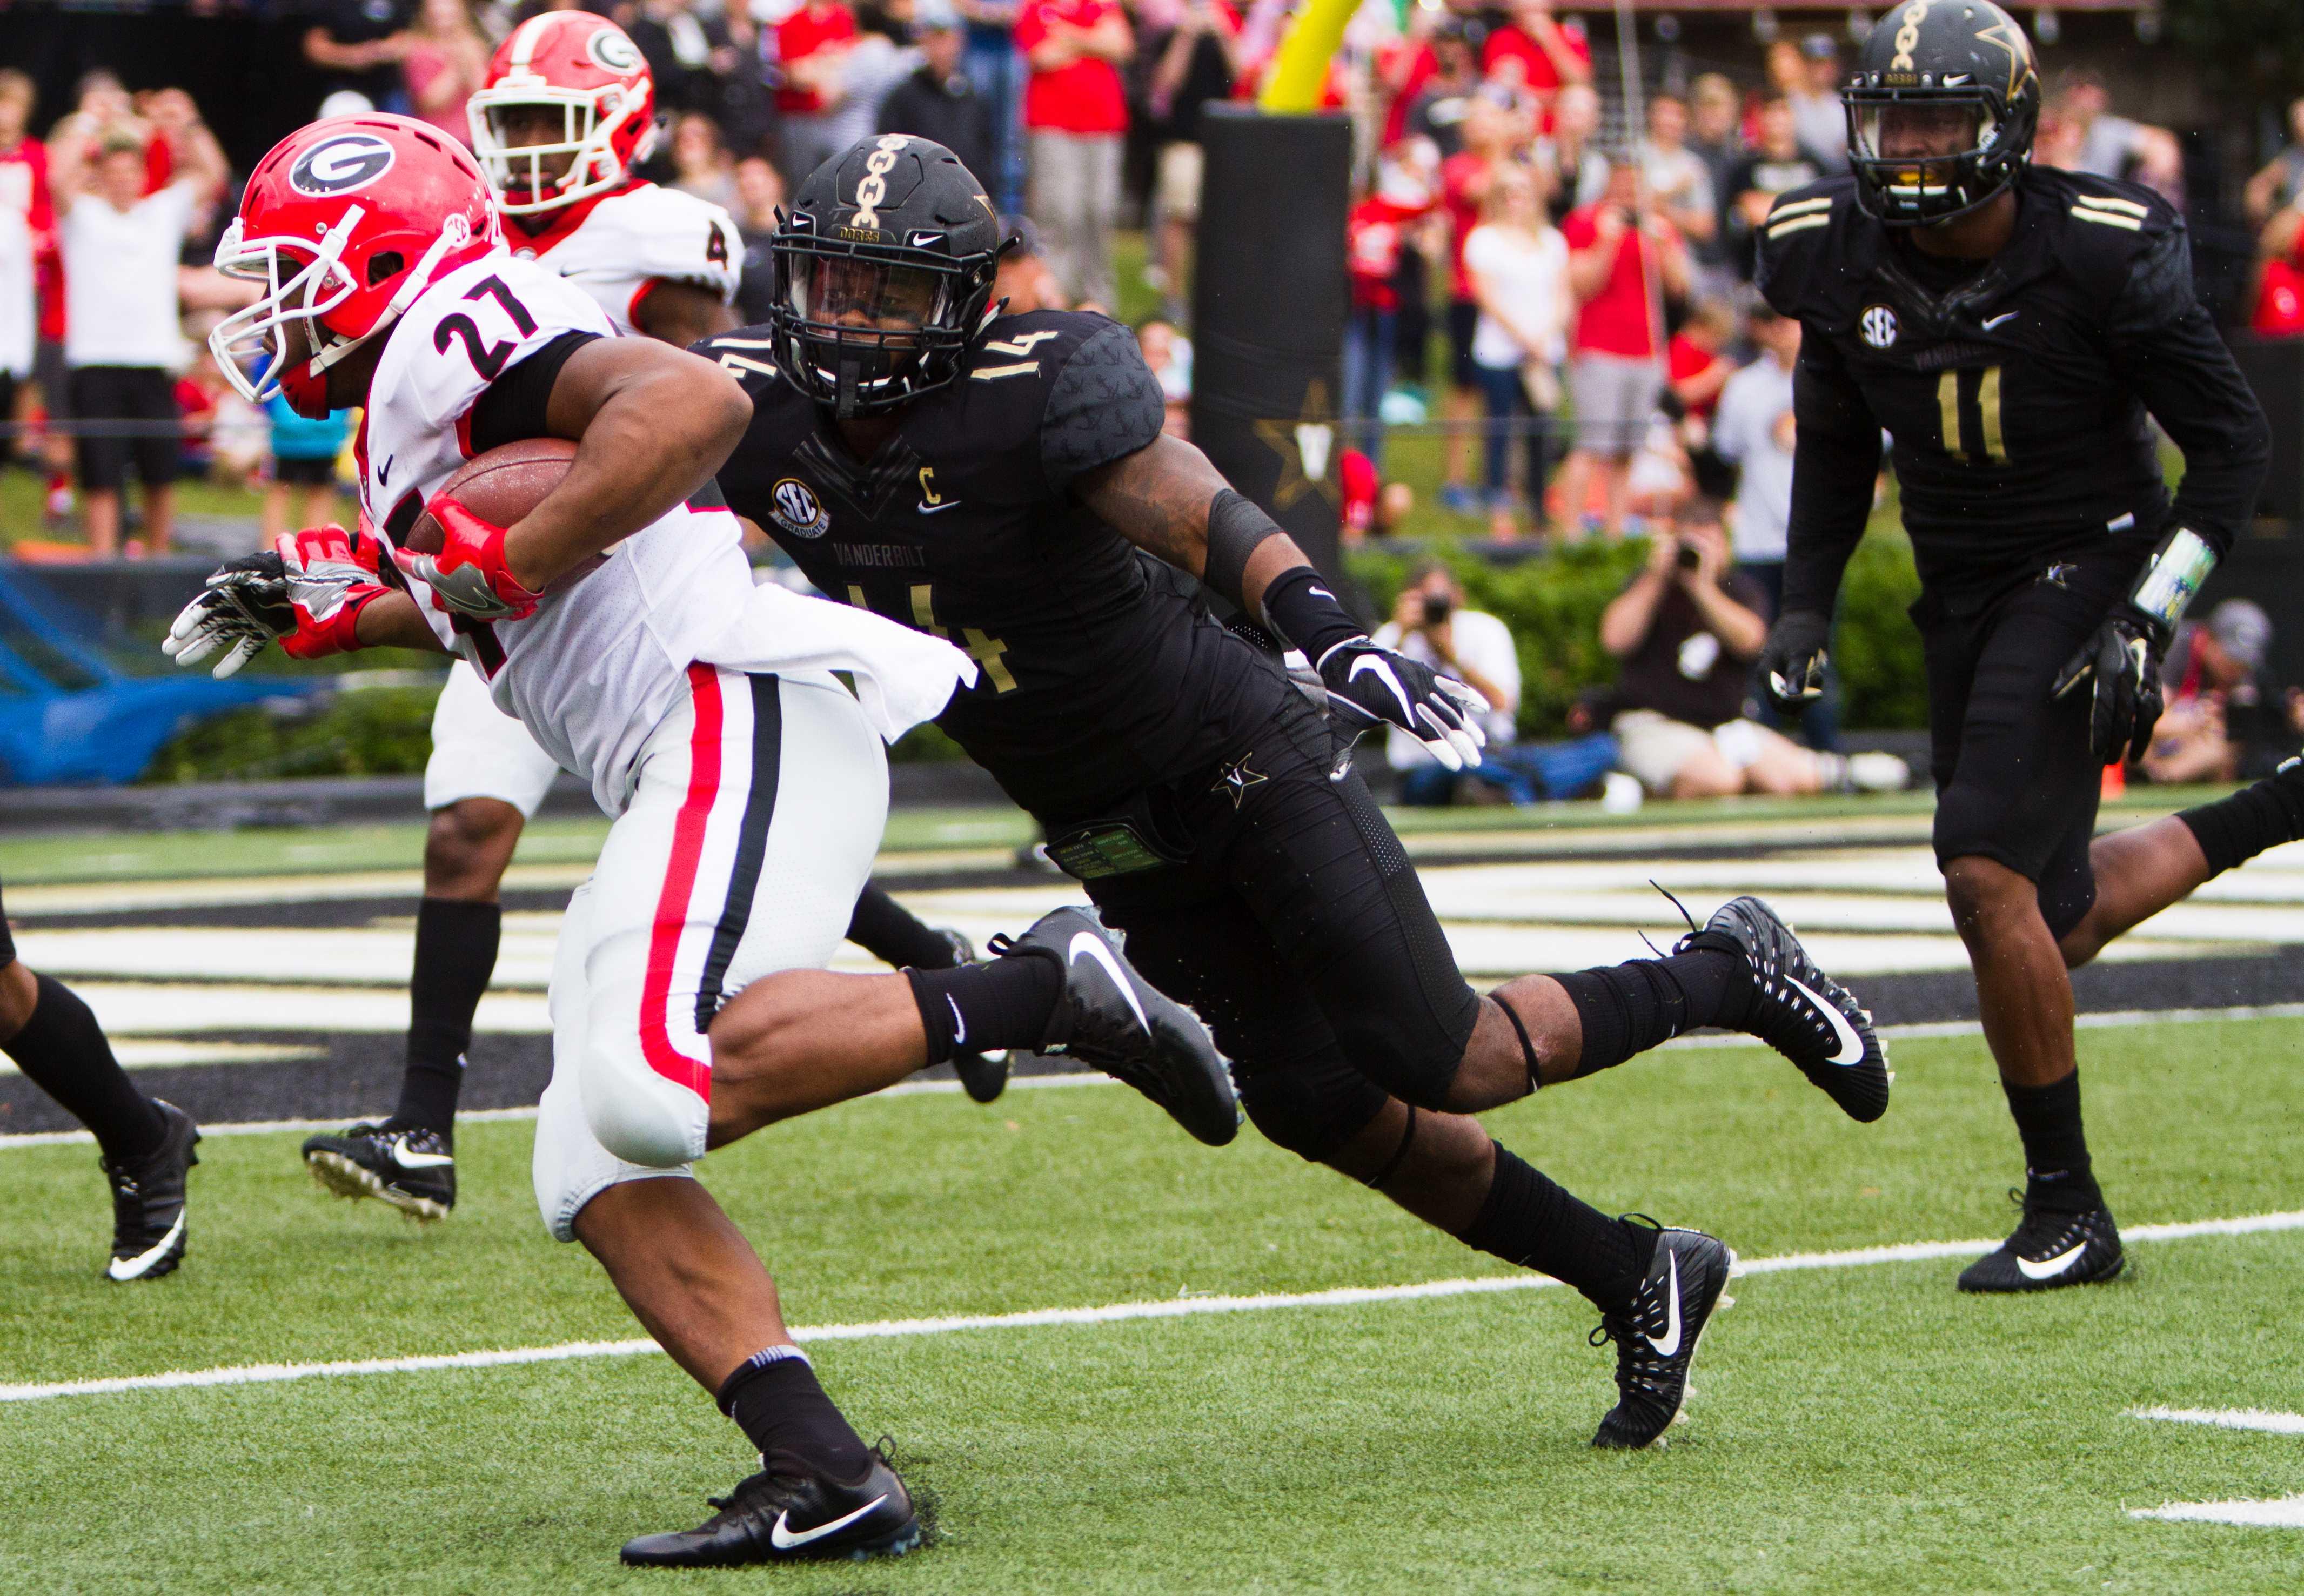 Vanderbilt plays against Georgia on Saturday, October 7, 2017. Photo by Hunter Long.